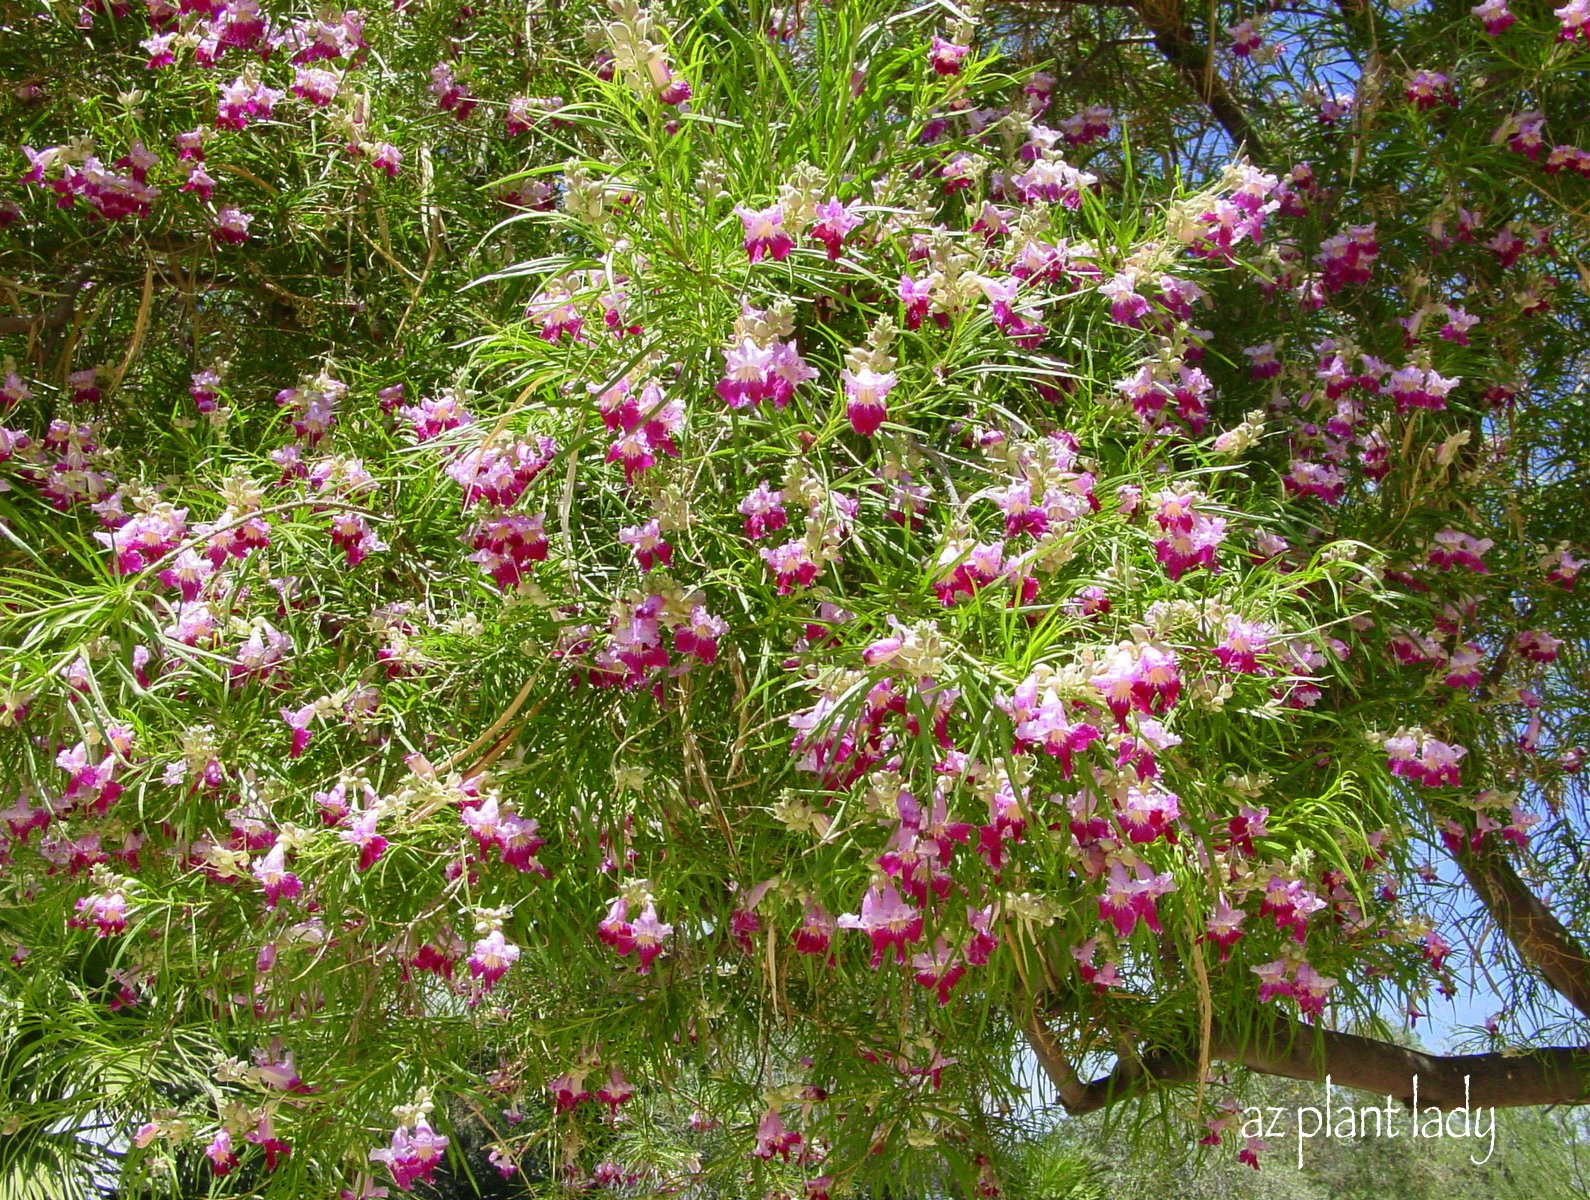 A flowering willowa lesser known tree for the garden a flowering willowa lesser known tree for the garden ramblings from a desert garden mightylinksfo